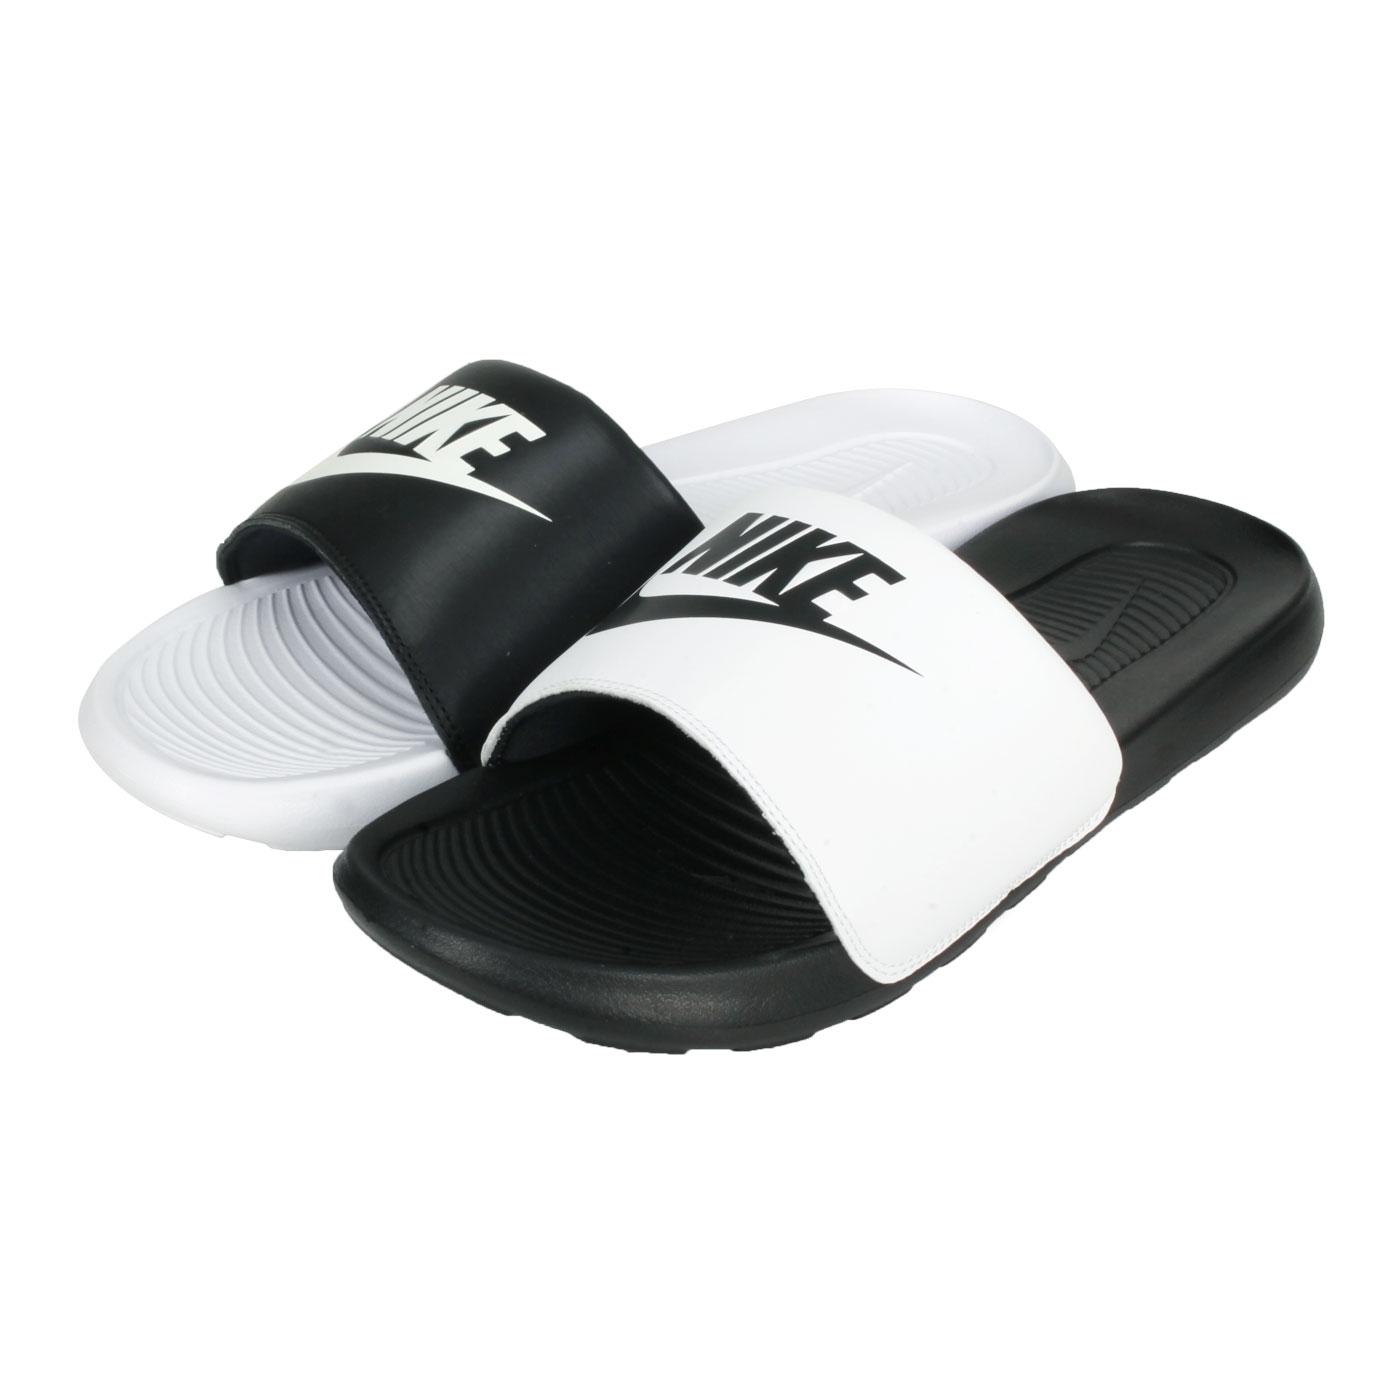 NIKE 男款休閒拖鞋  @VICTORI ONE SLIDE MIX@DD0234-100